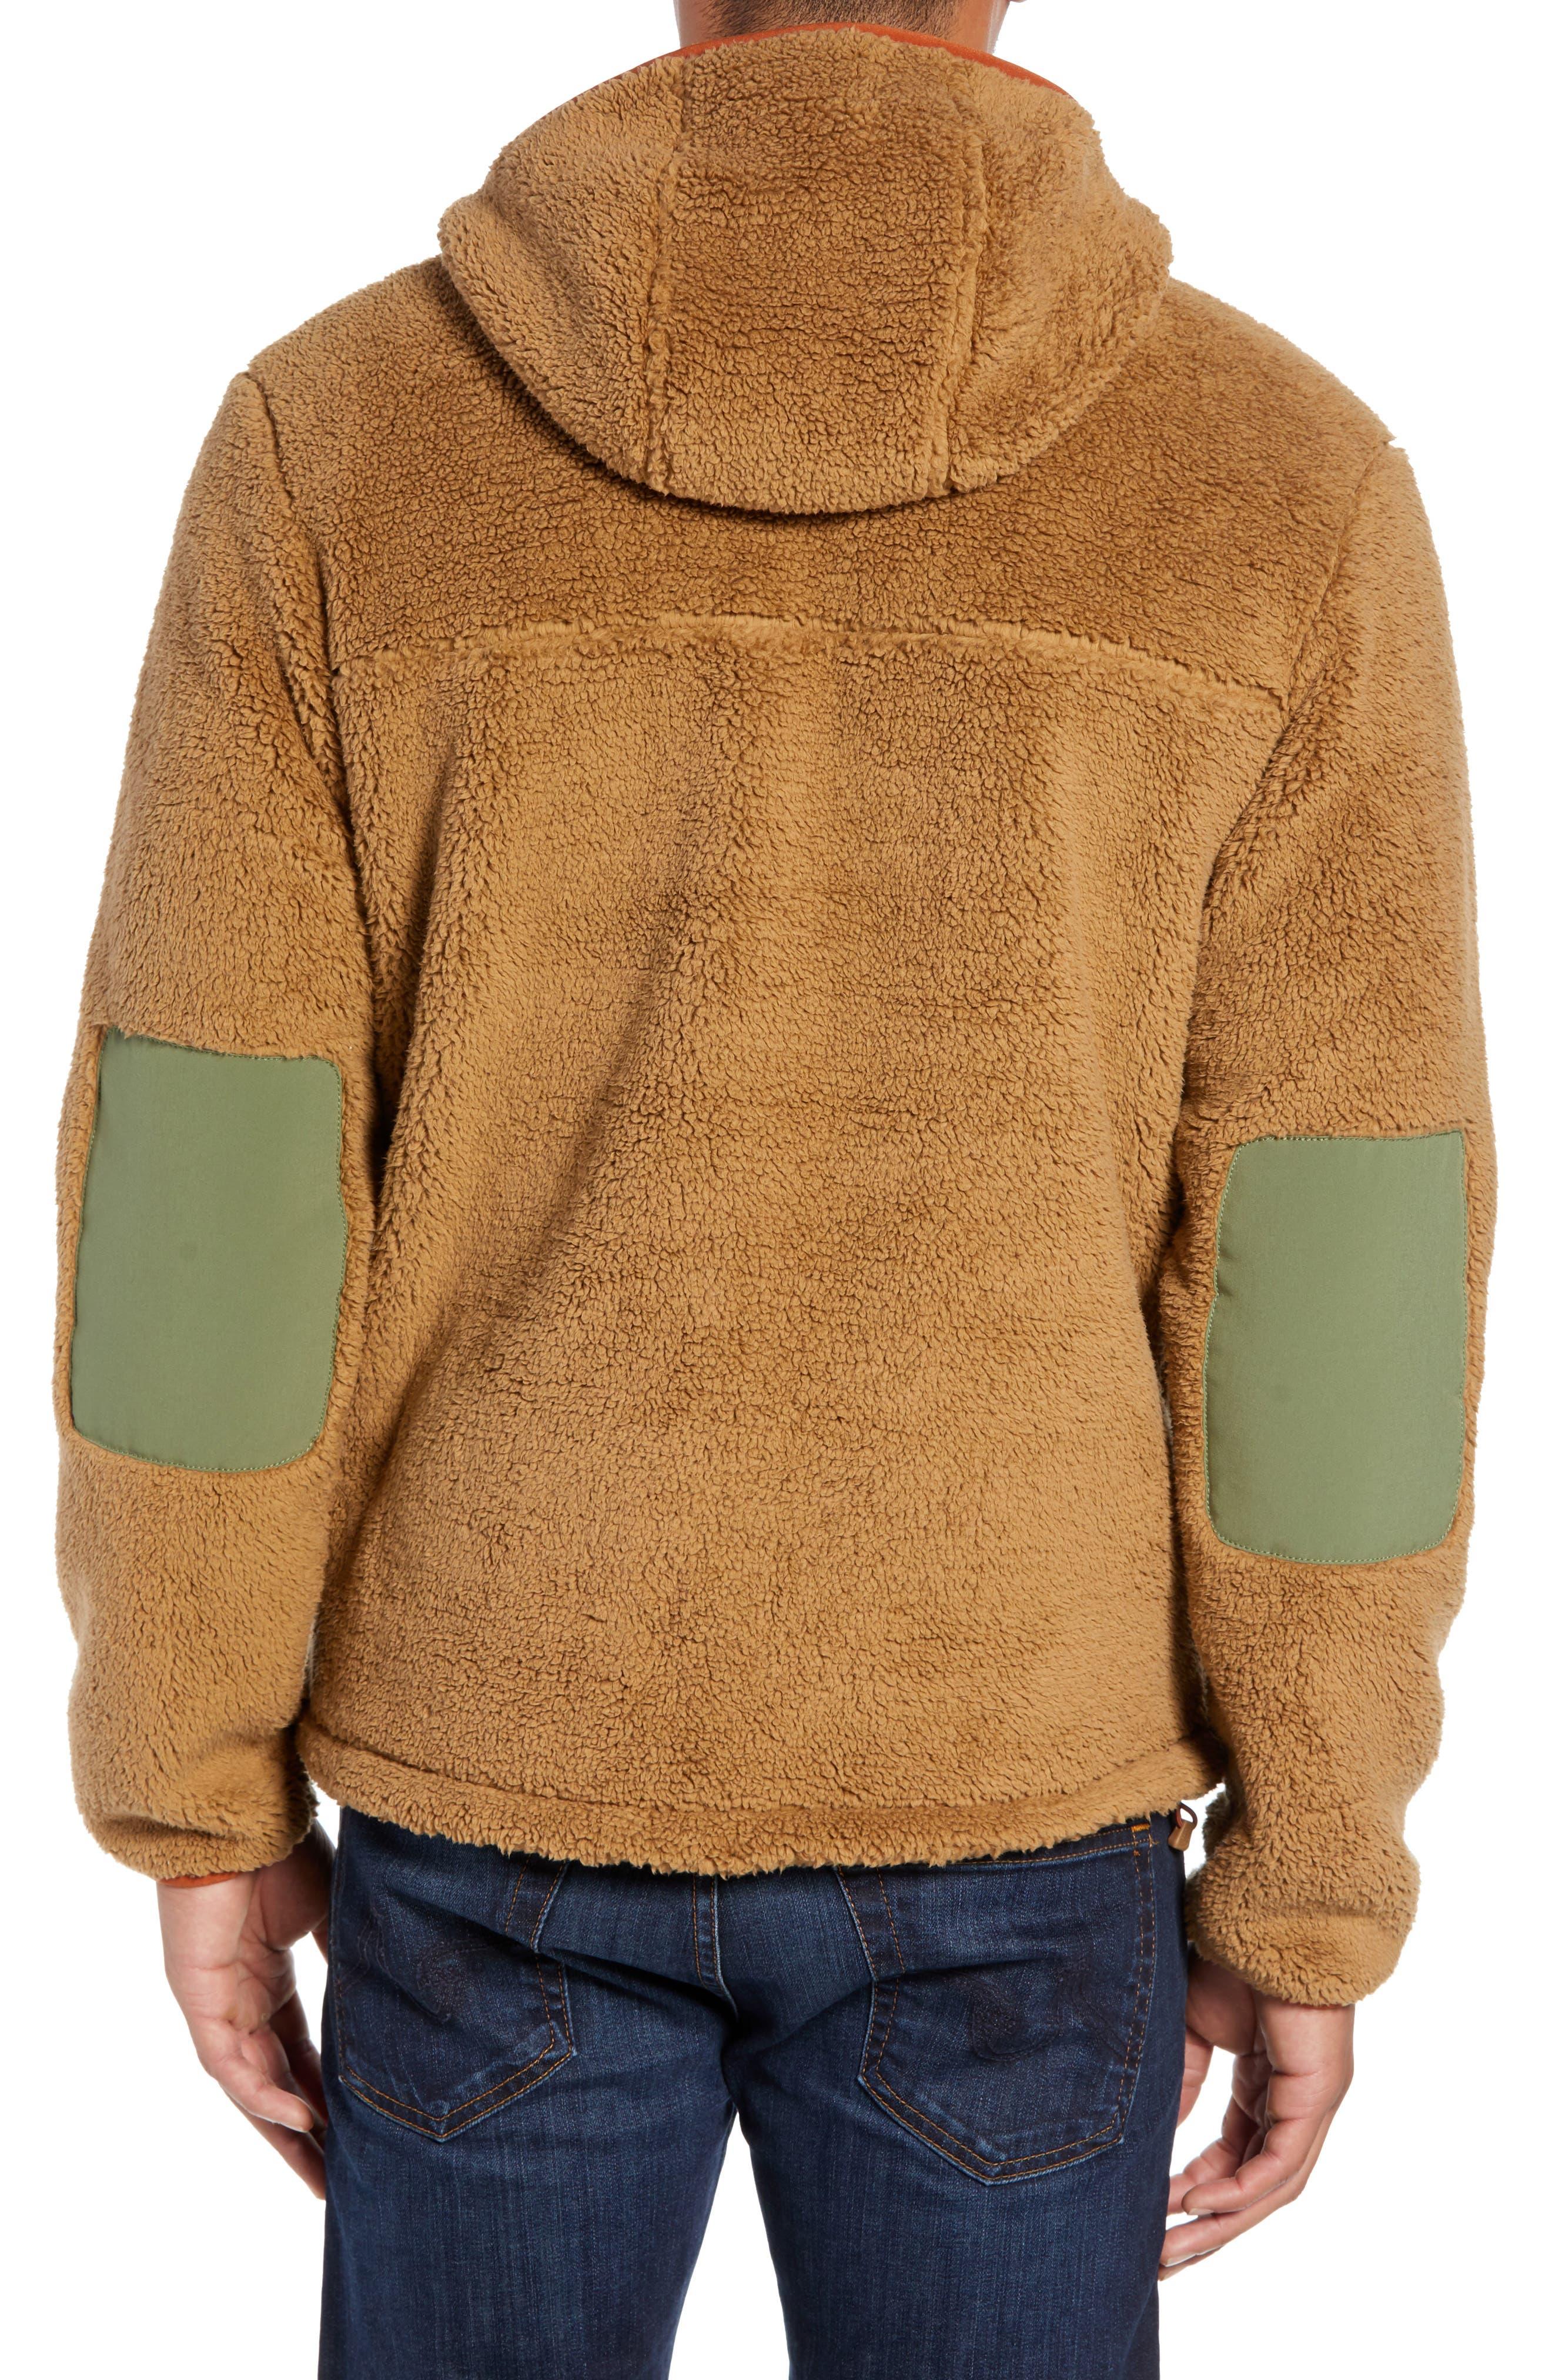 THE NORTH FACE,                             Campshire Anorak Fleece Jacket,                             Alternate thumbnail 2, color,                             CARGO KHAKI/ FOUR LEAF CLOVER